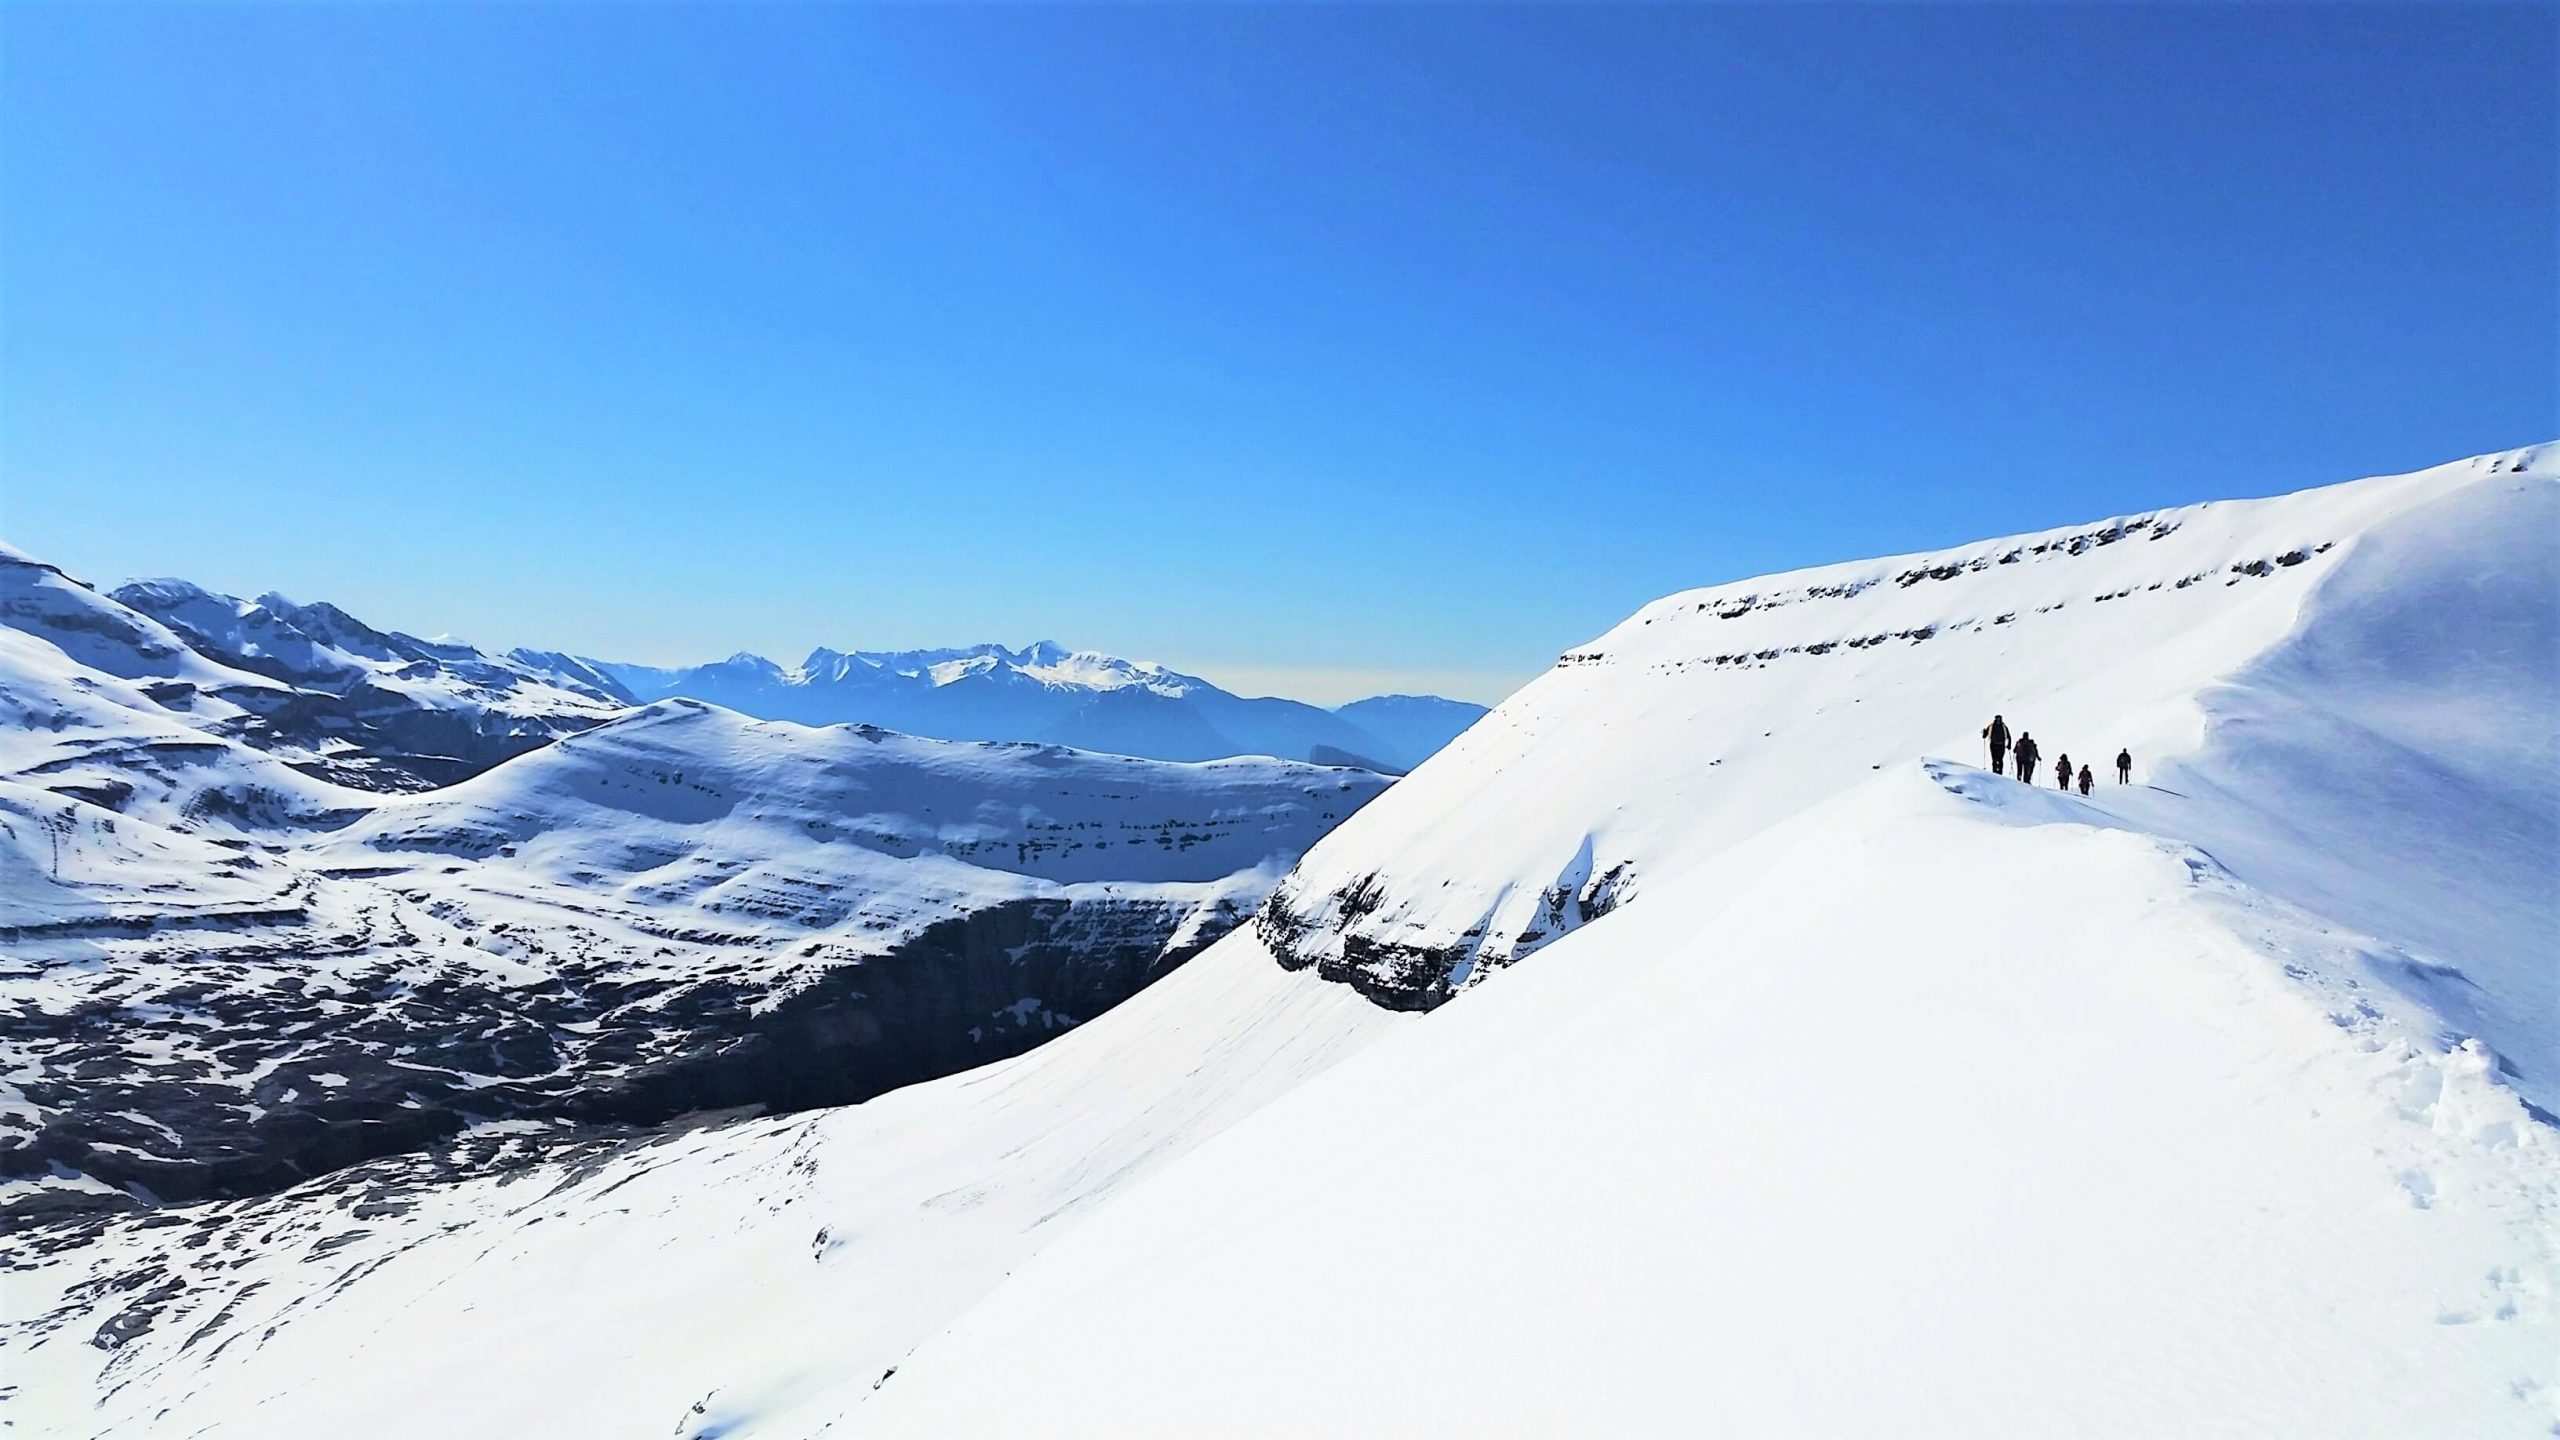 Valle de Ordesa Nevado. Alpinismo